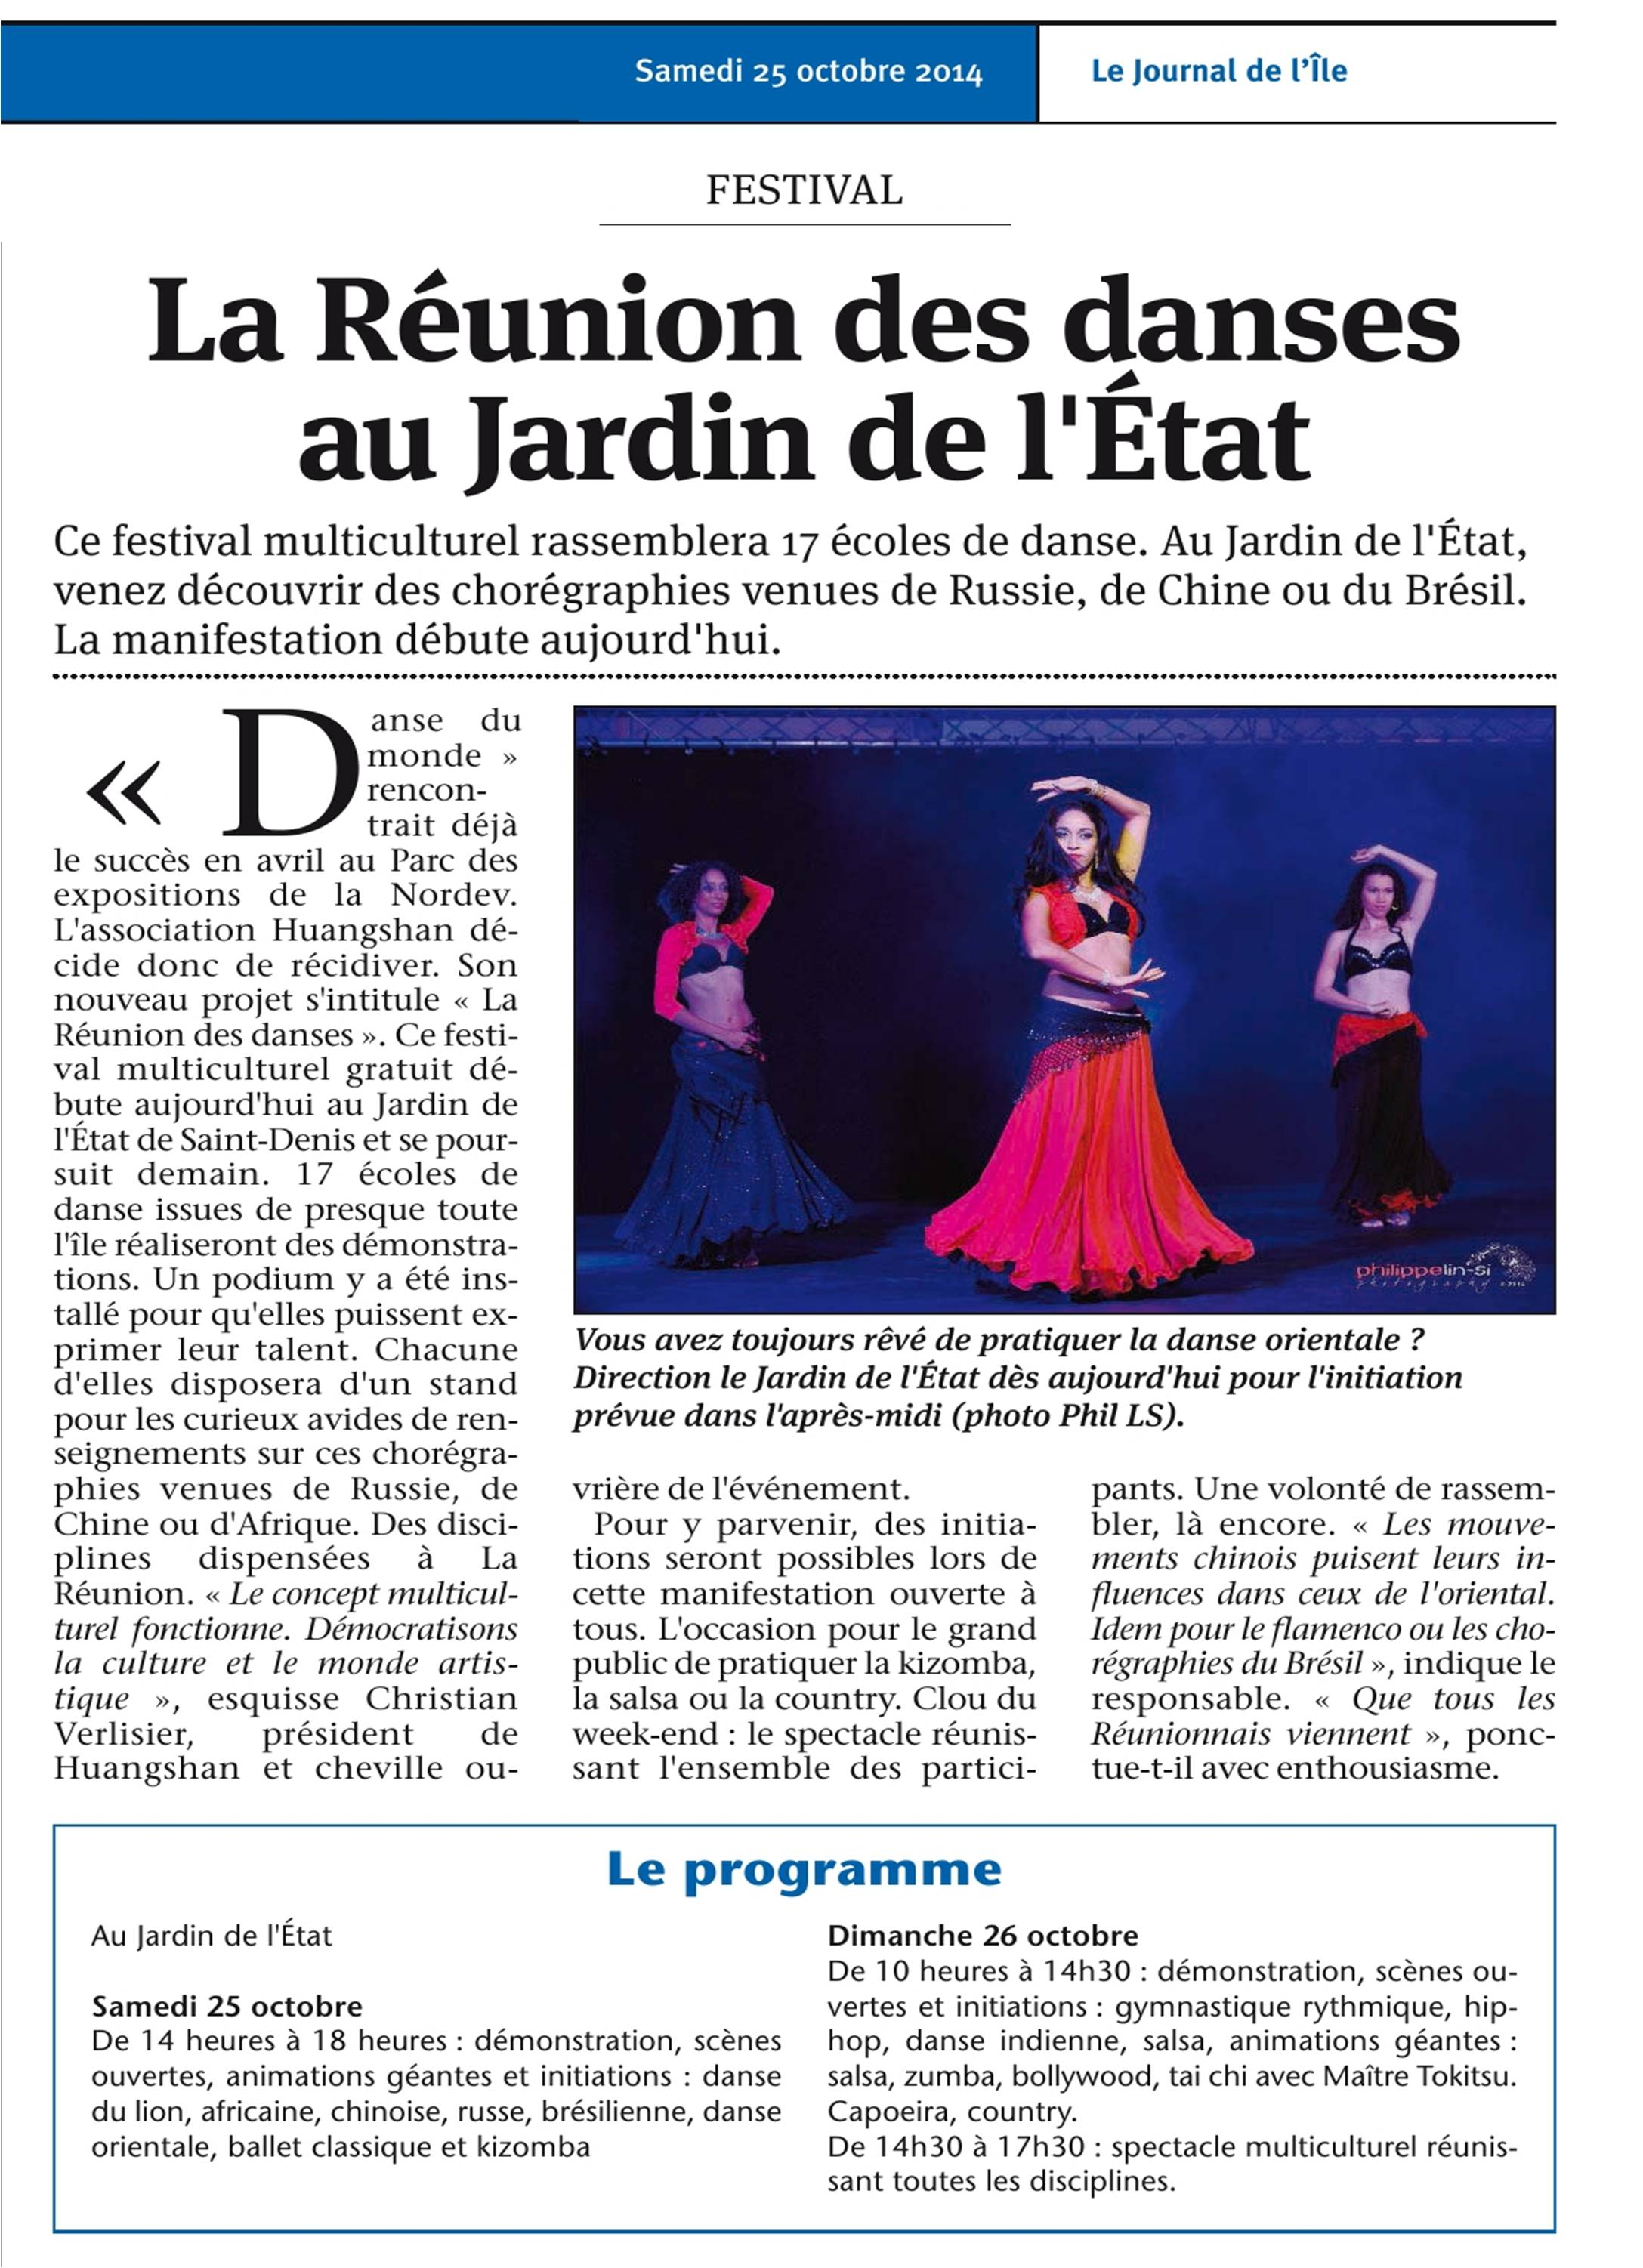 Page 16.JIR_DU_25-10-2014 ok